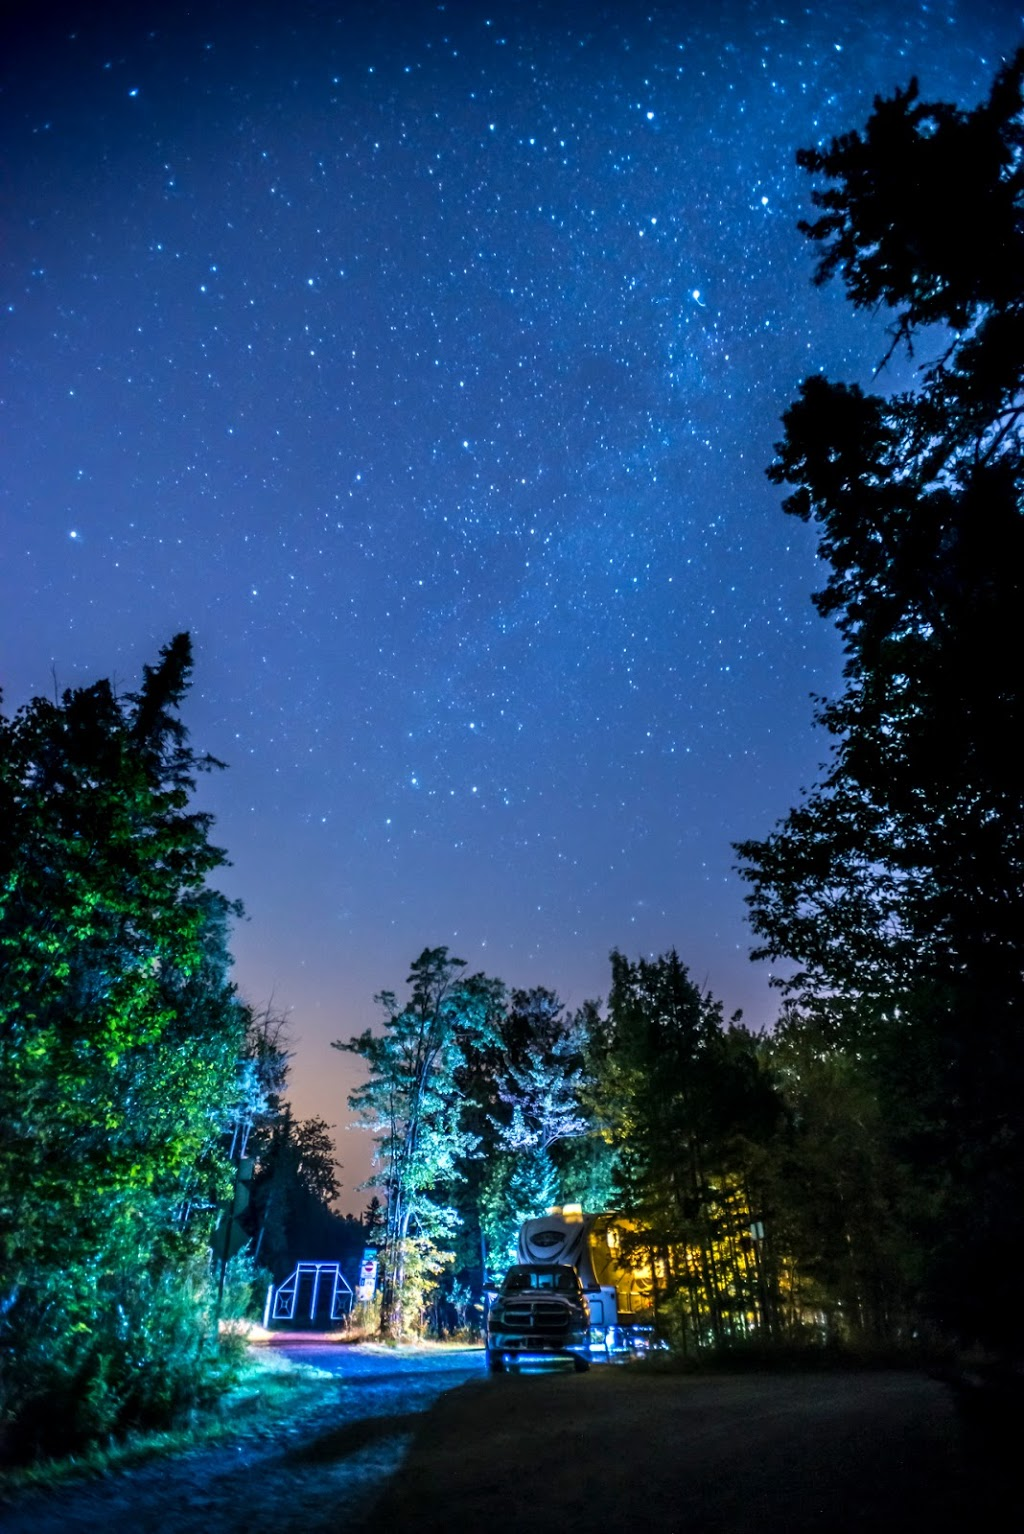 Station touristique Baie-des-Sables | campground | 2370 Rue de la Baie des Sables, Marston, QC G0Y 1G0, Canada | 8195833965 OR +1 819-583-3965